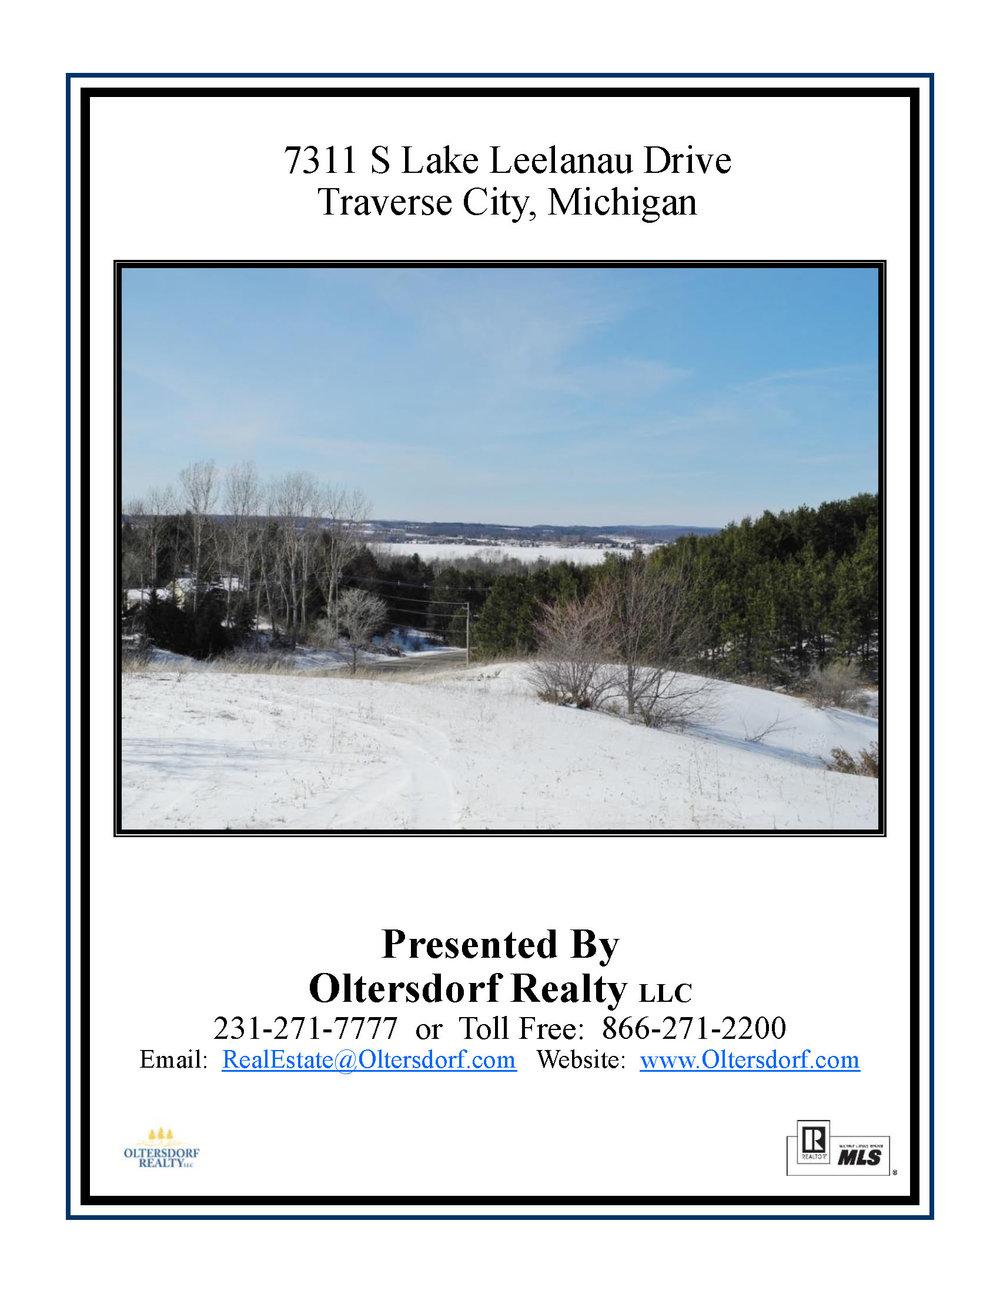 7311 S Lake Leelanau Drive, Traverse City Acreage for sale in Leelanau County by Oltersdorf Realty LLC (1).jpg